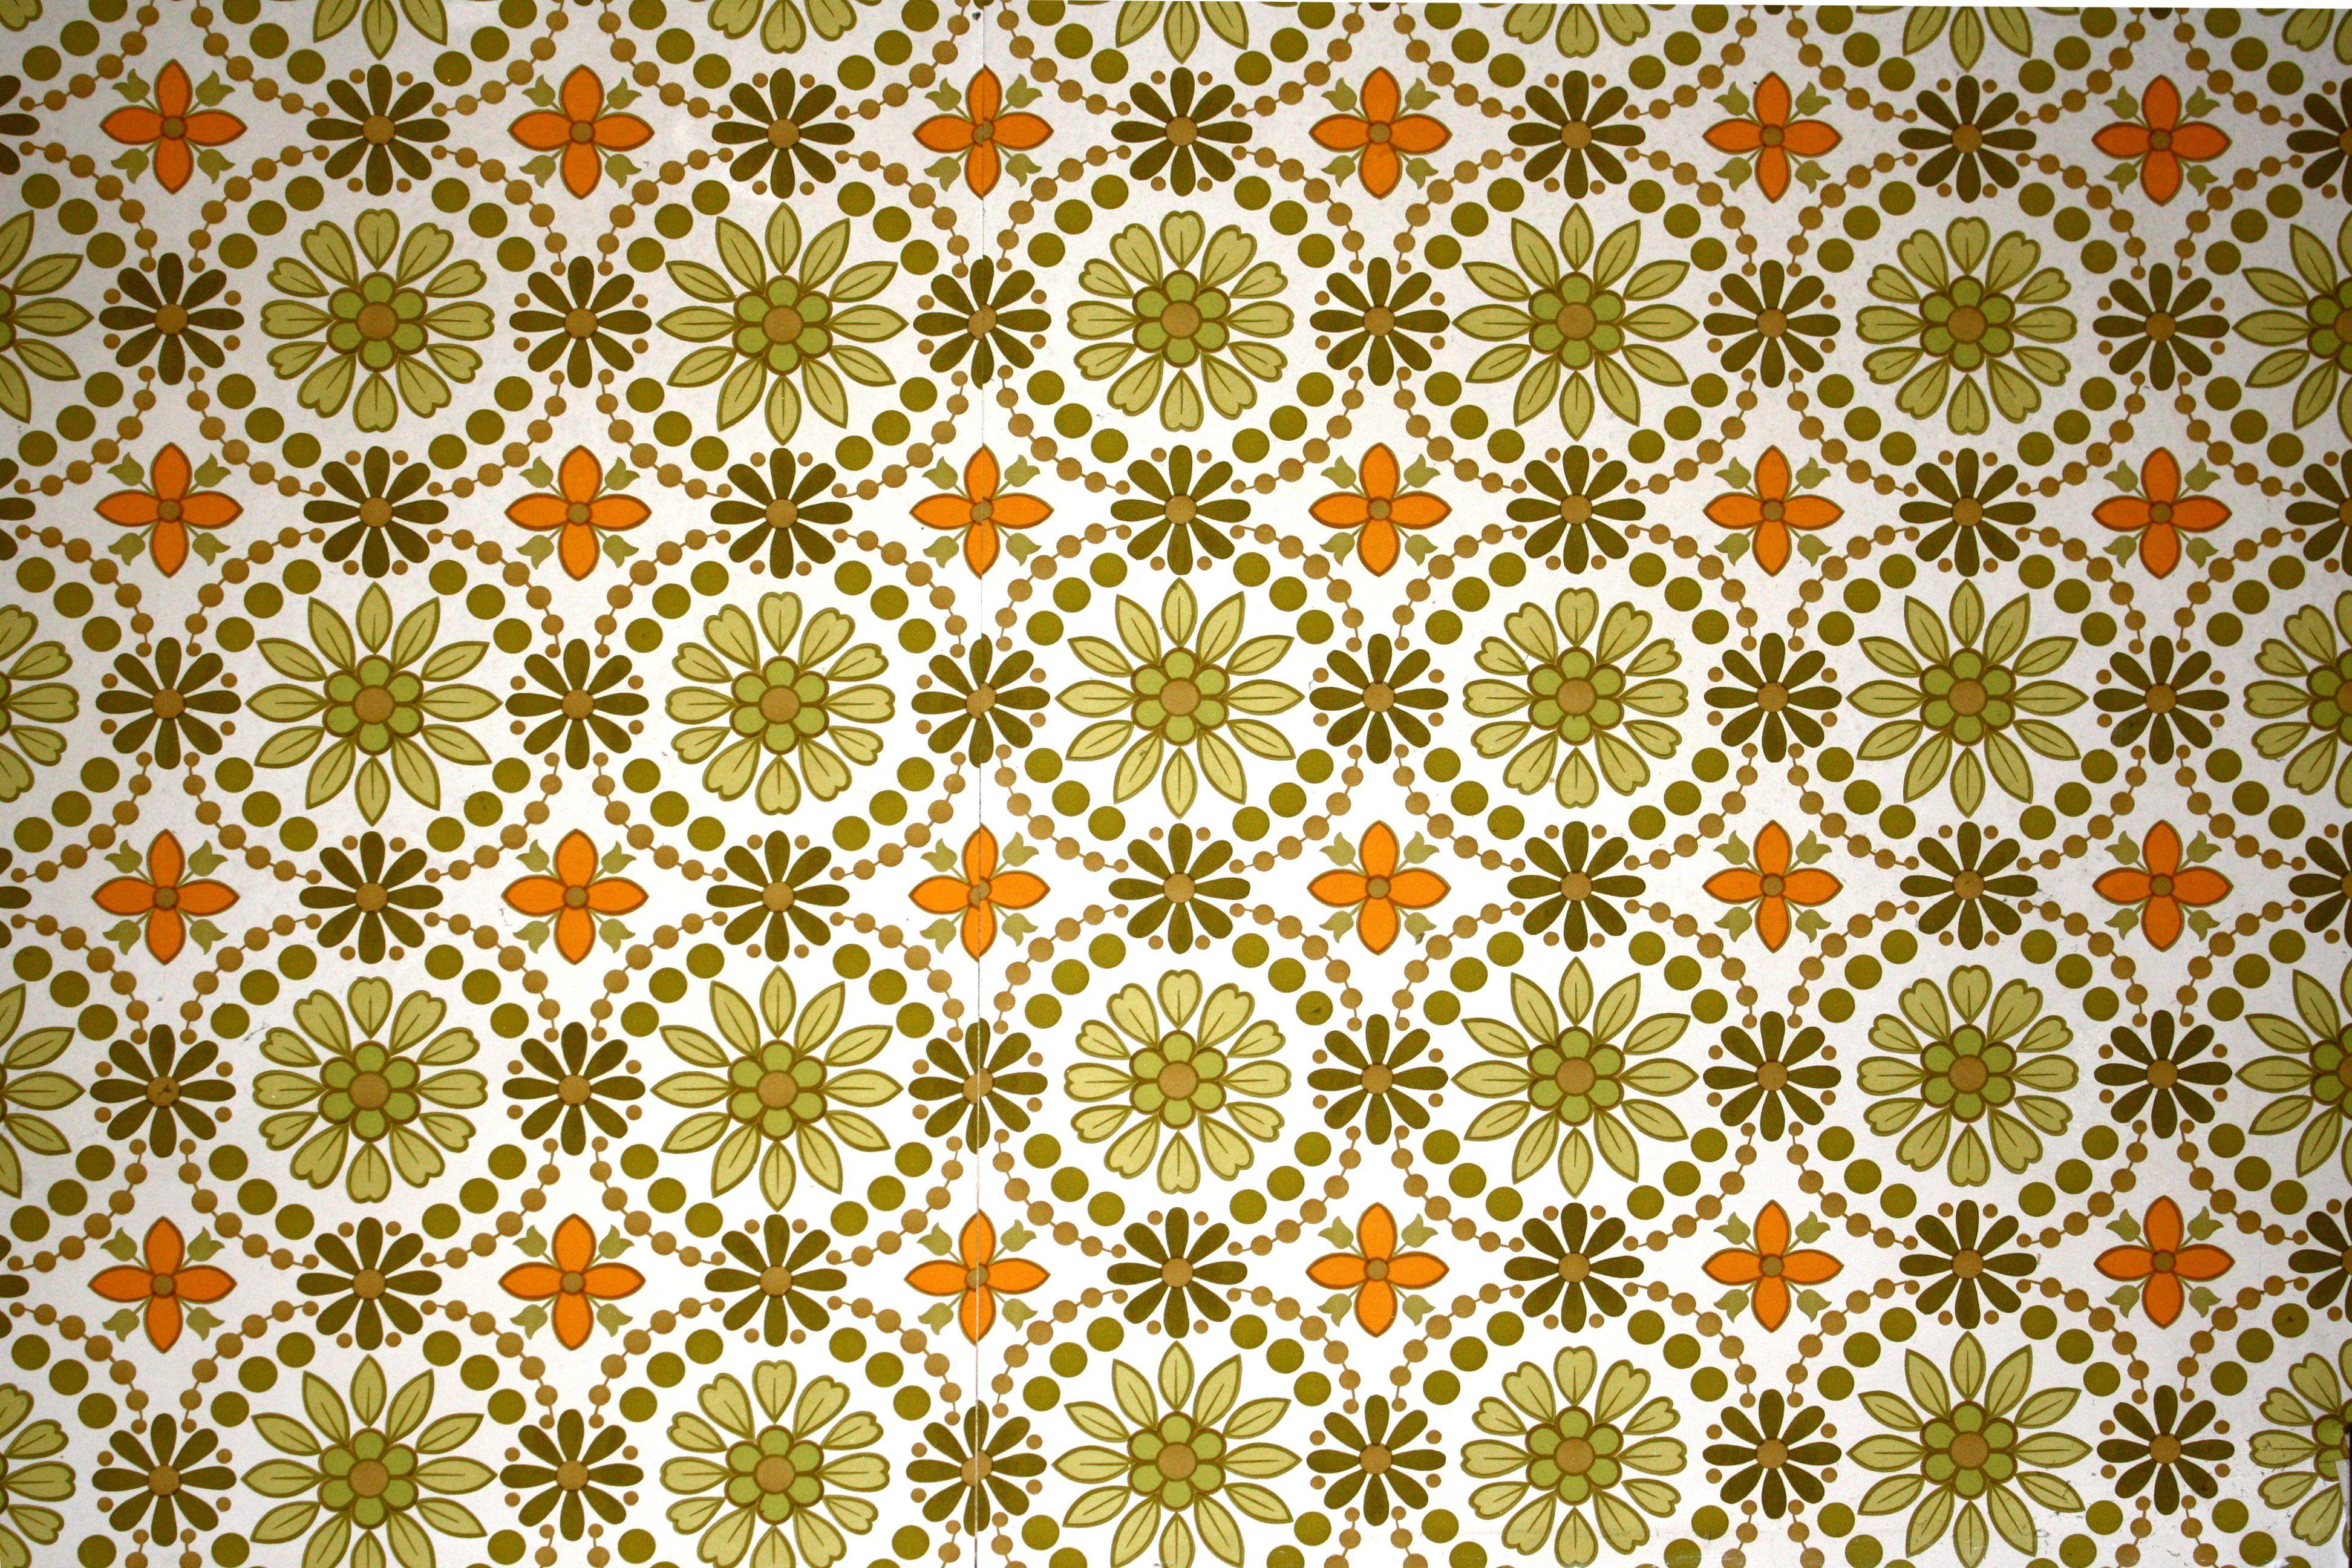 Green And Orange Flower Wallpaper Texture